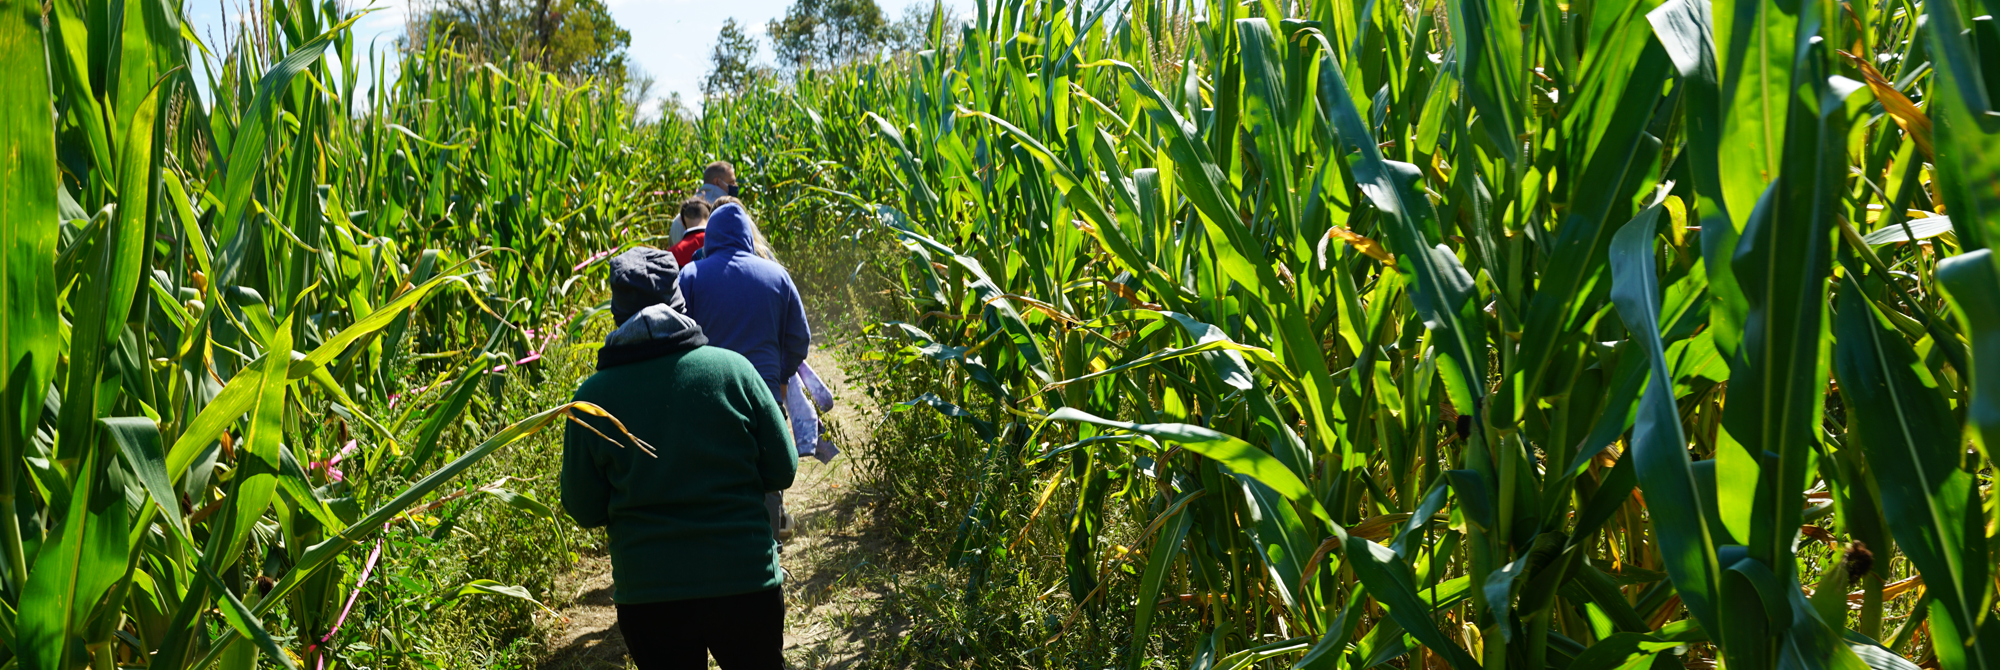 Ekonk Hill Corn Maze